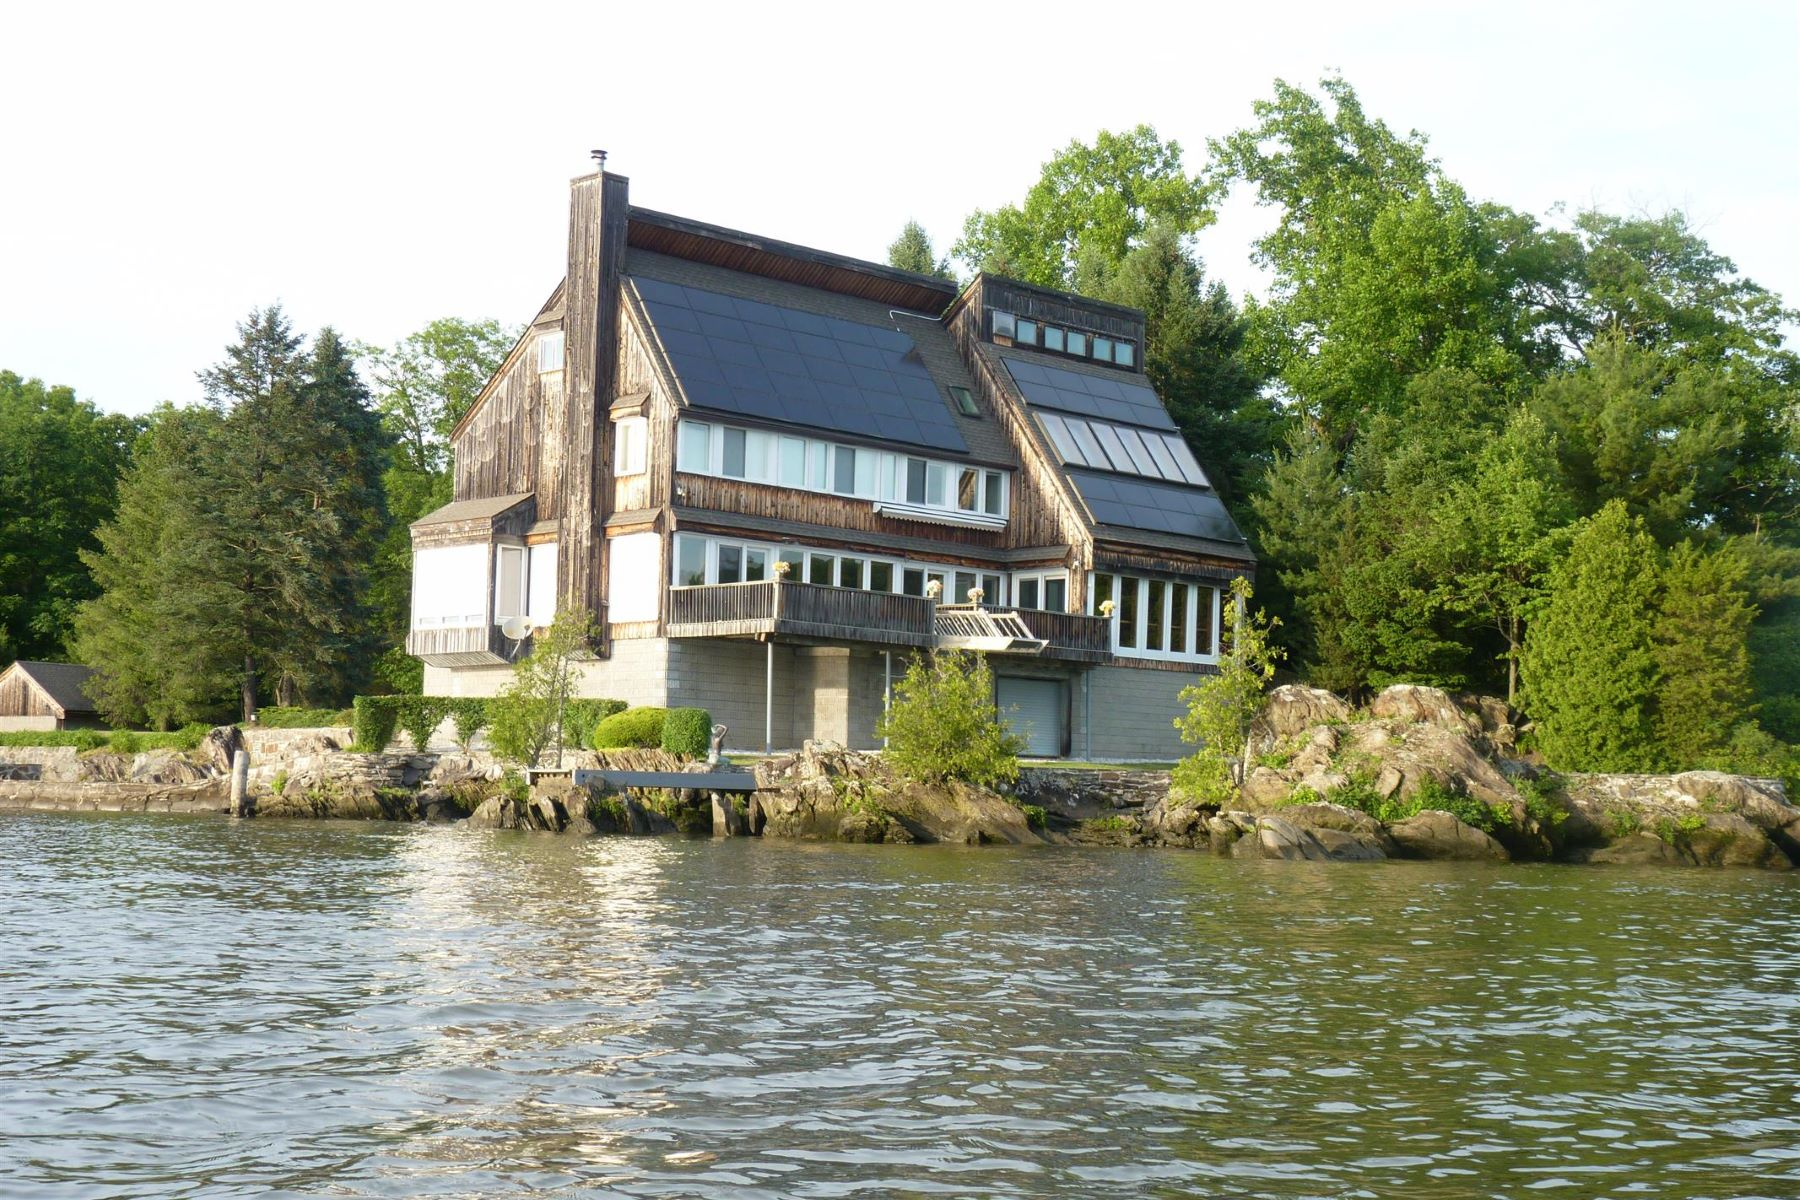 Частный односемейный дом для того Продажа на Bolles Island on the Hudson River 16 Poppinga Lane Hyde Park, Нью-Йорк 12538 Соединенные Штаты